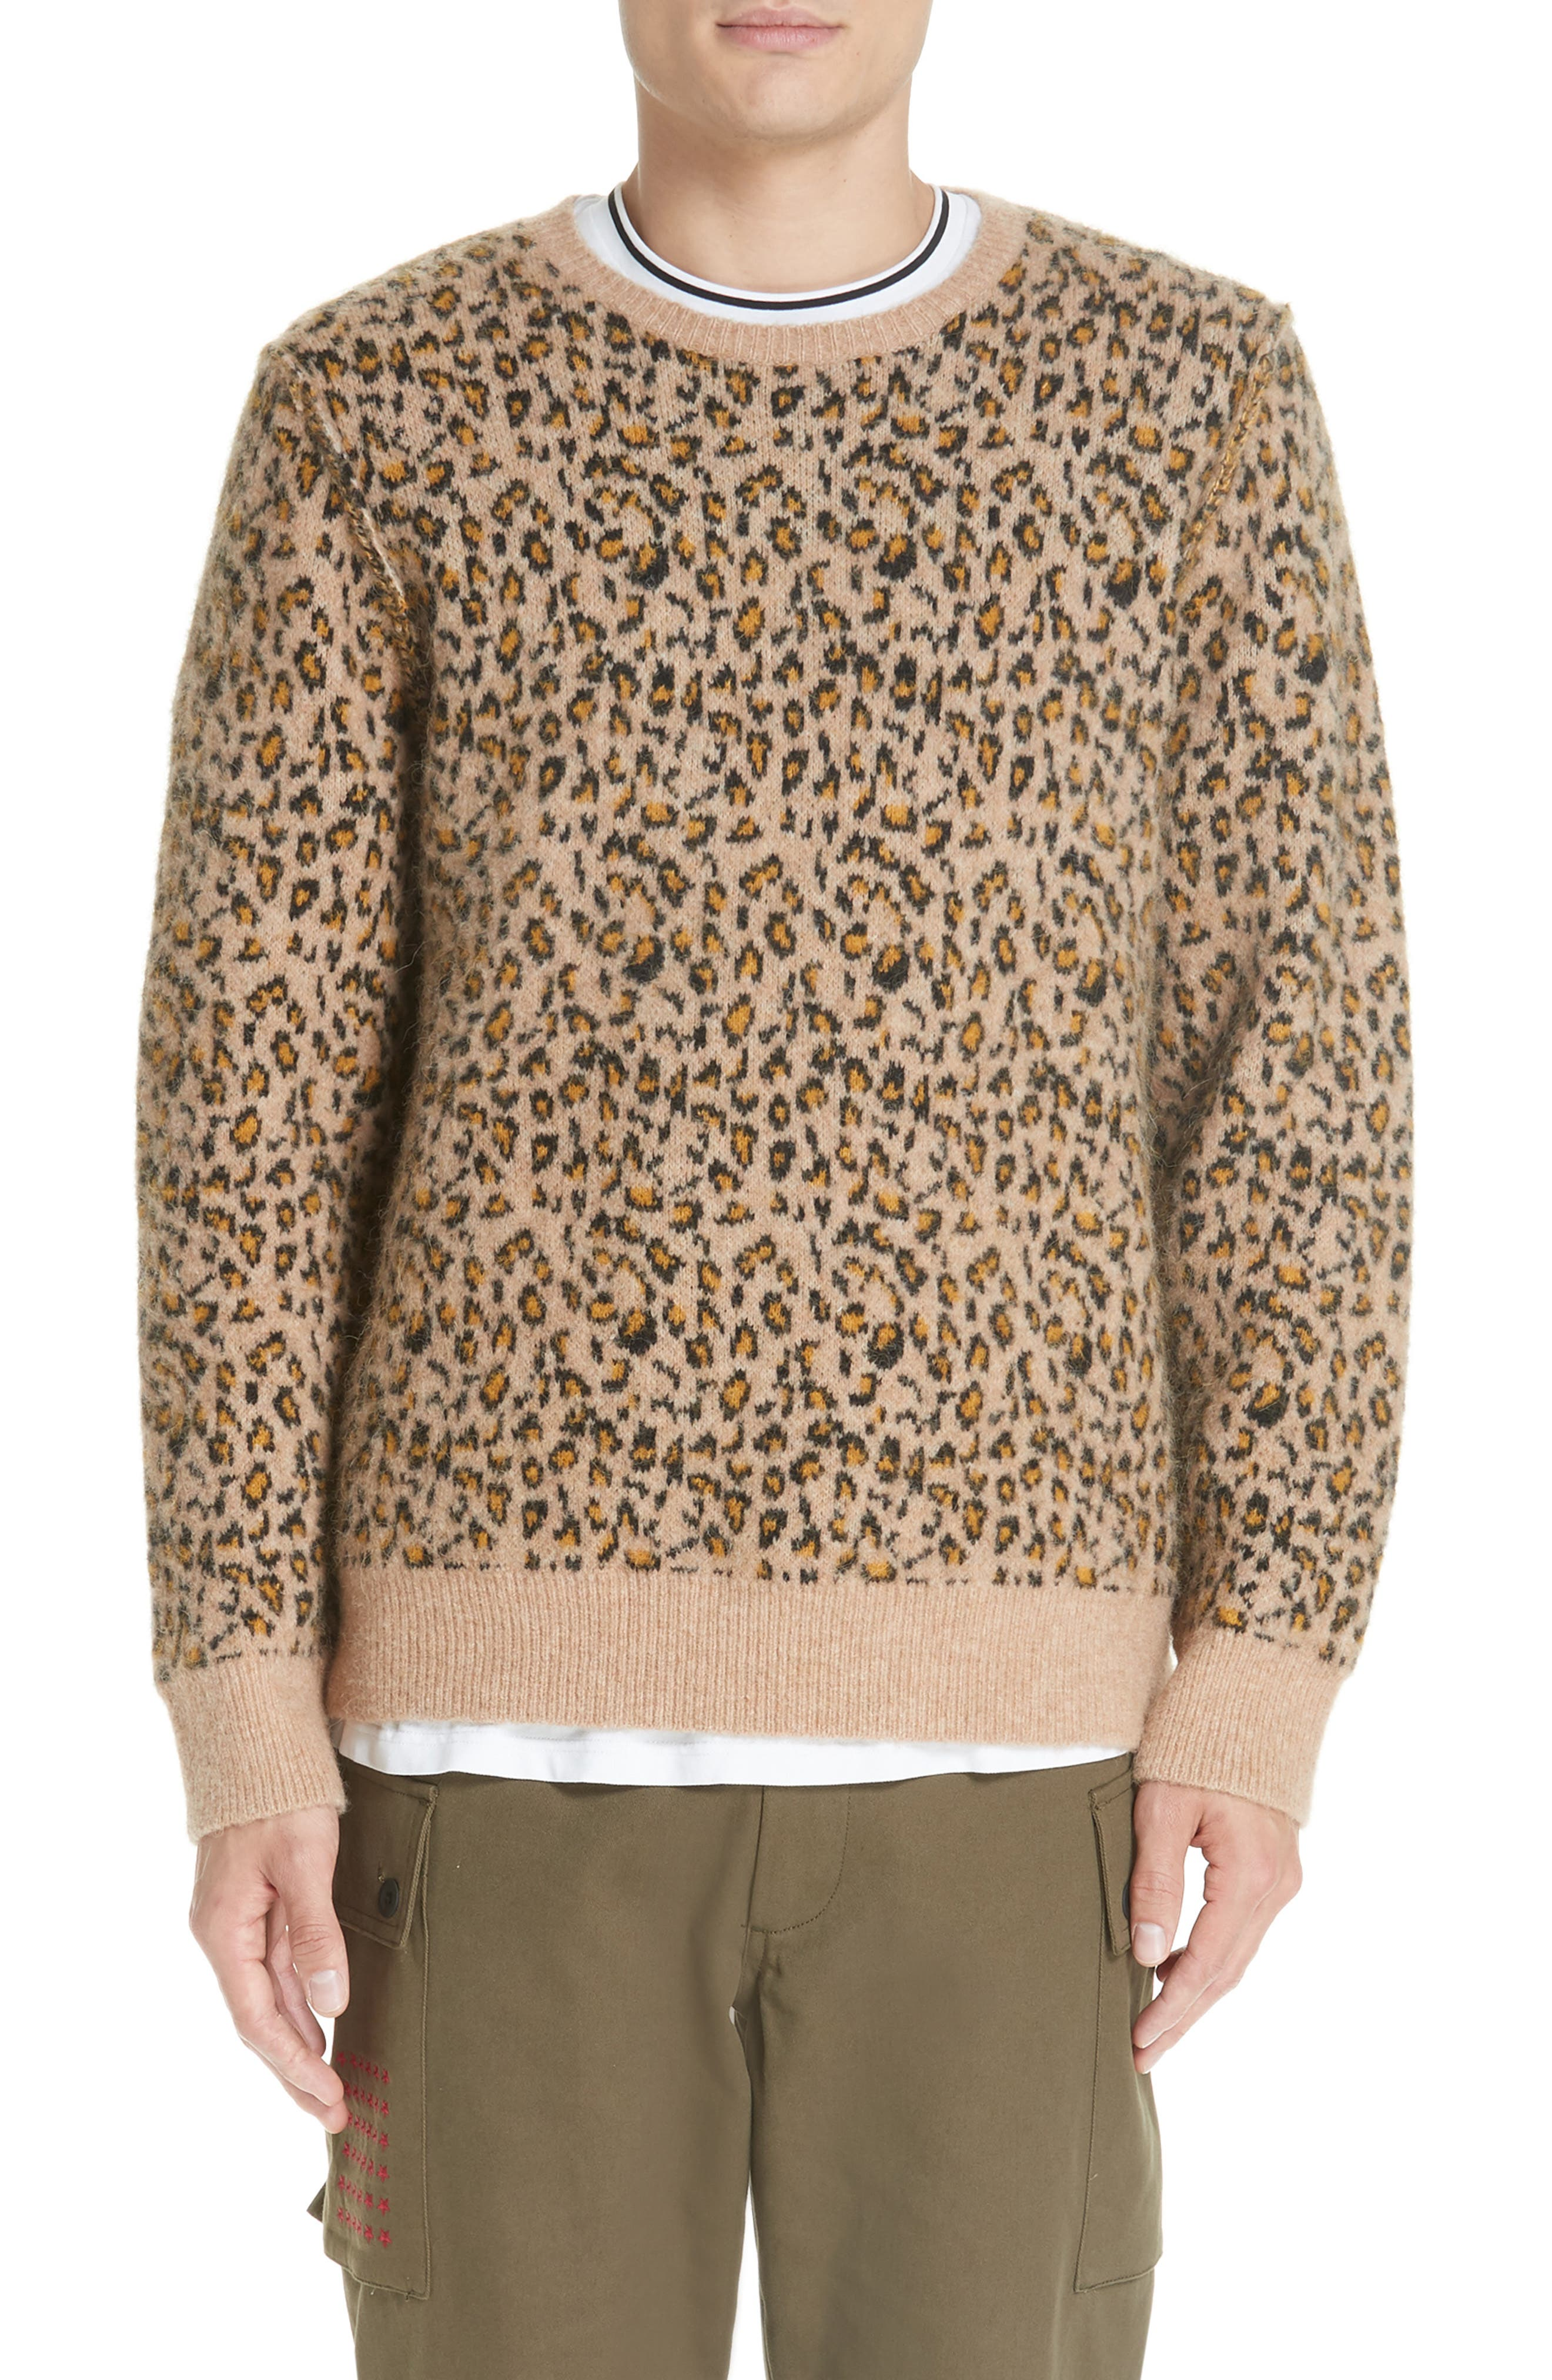 OVADIA & SONS Men'S Leopard Pattern Jacquard Crewneck Sweater